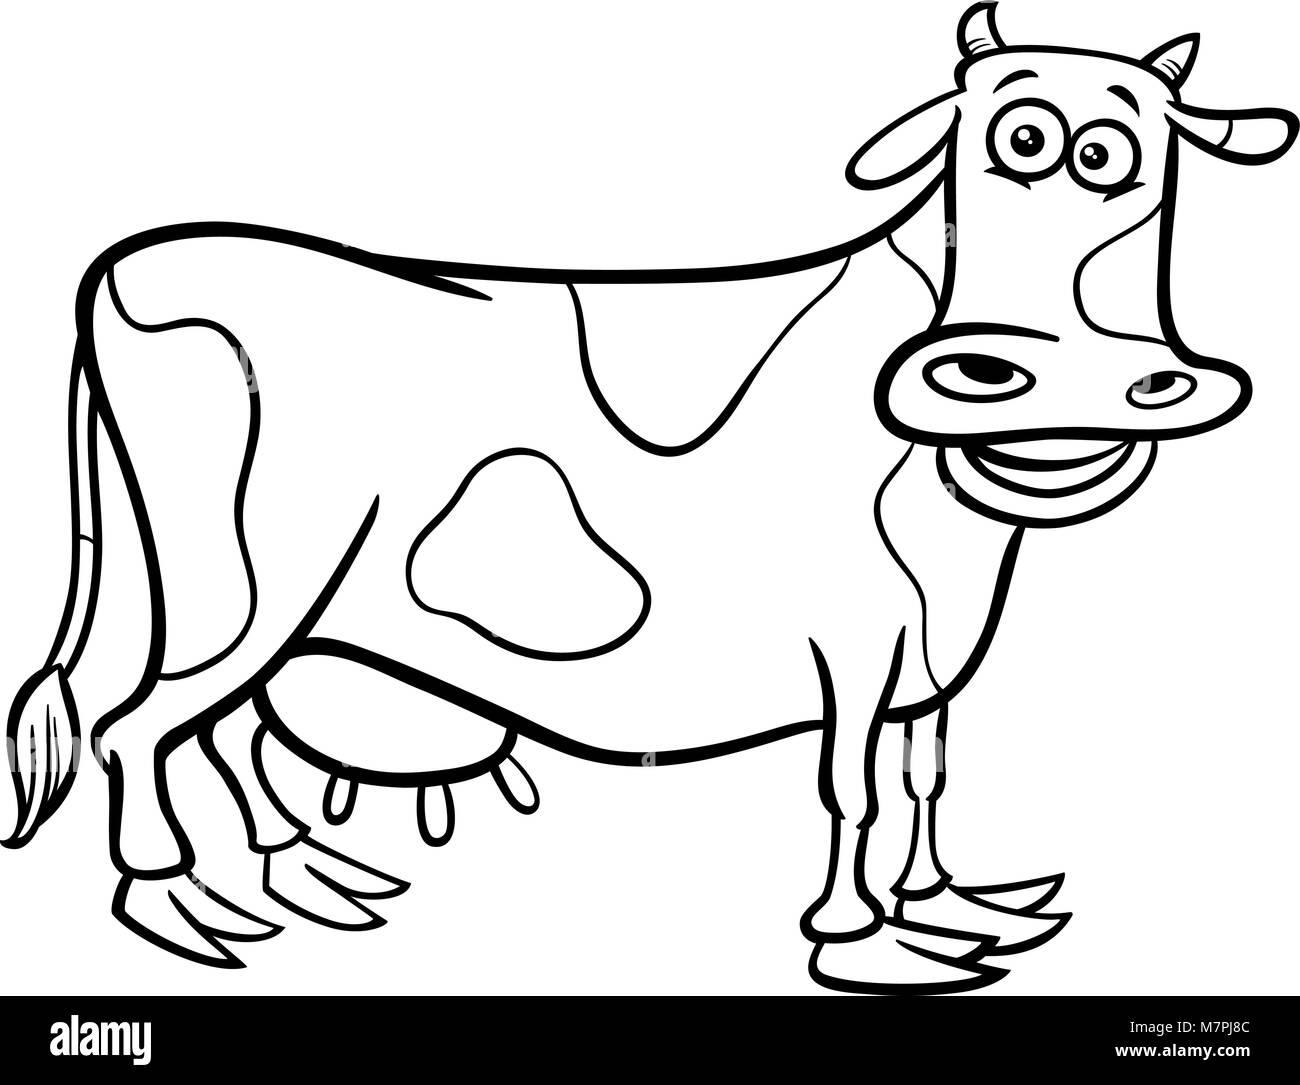 Black and White Cartoon Illustration of Milker Cow Farm Animal Stock ...